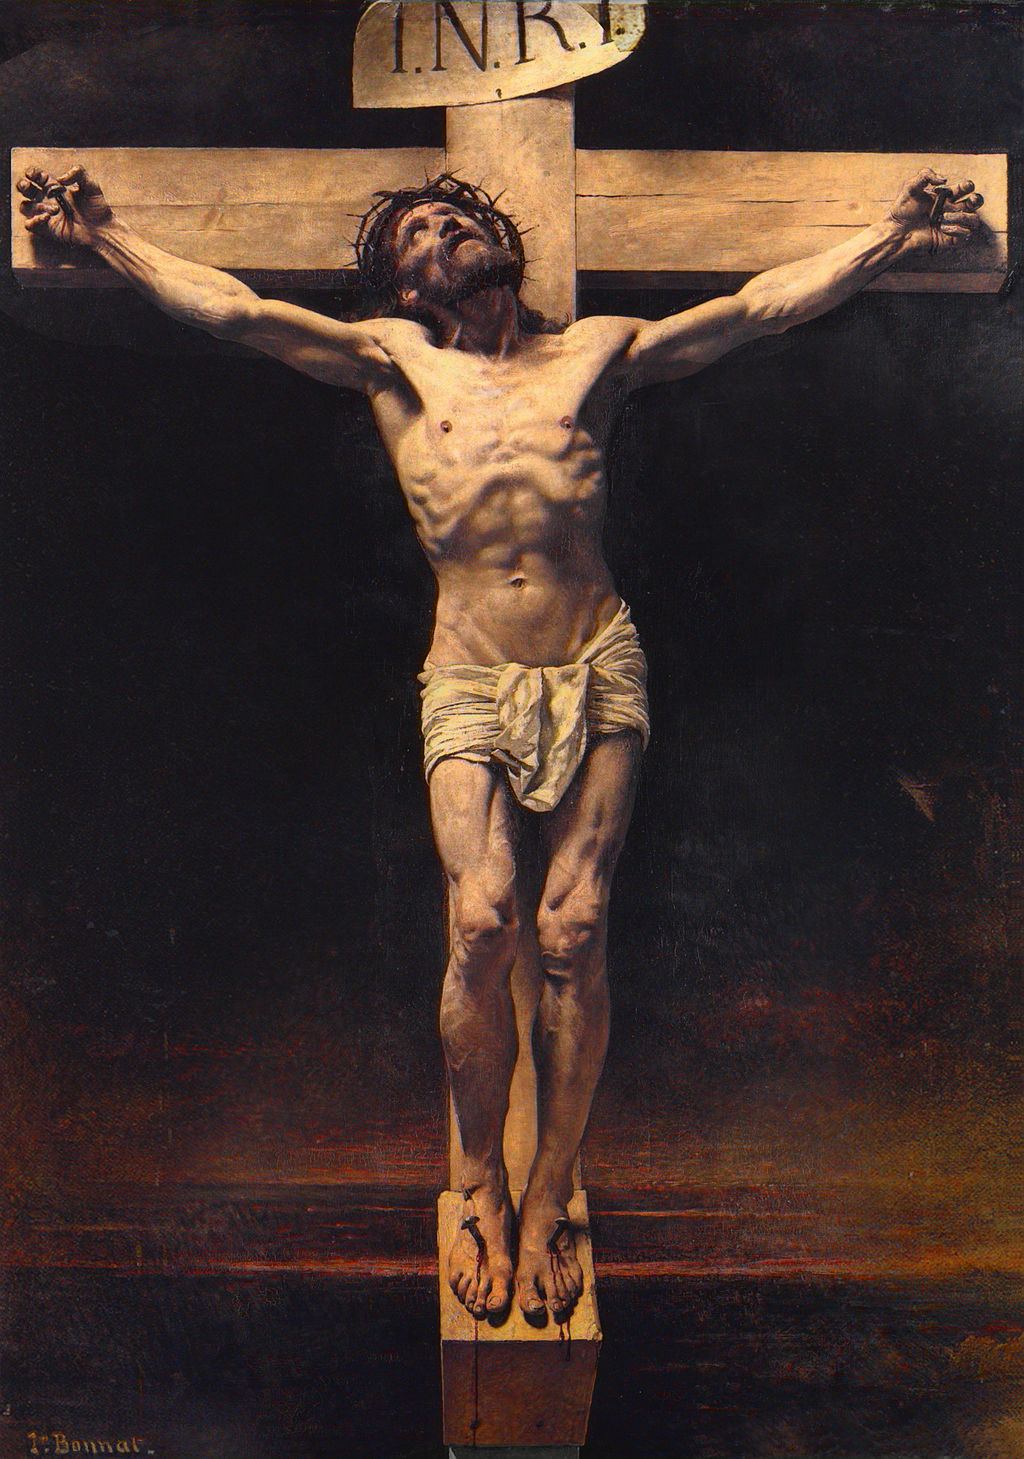 Christ on the Cross by Léon Bonnat, via Wikimedia Commons